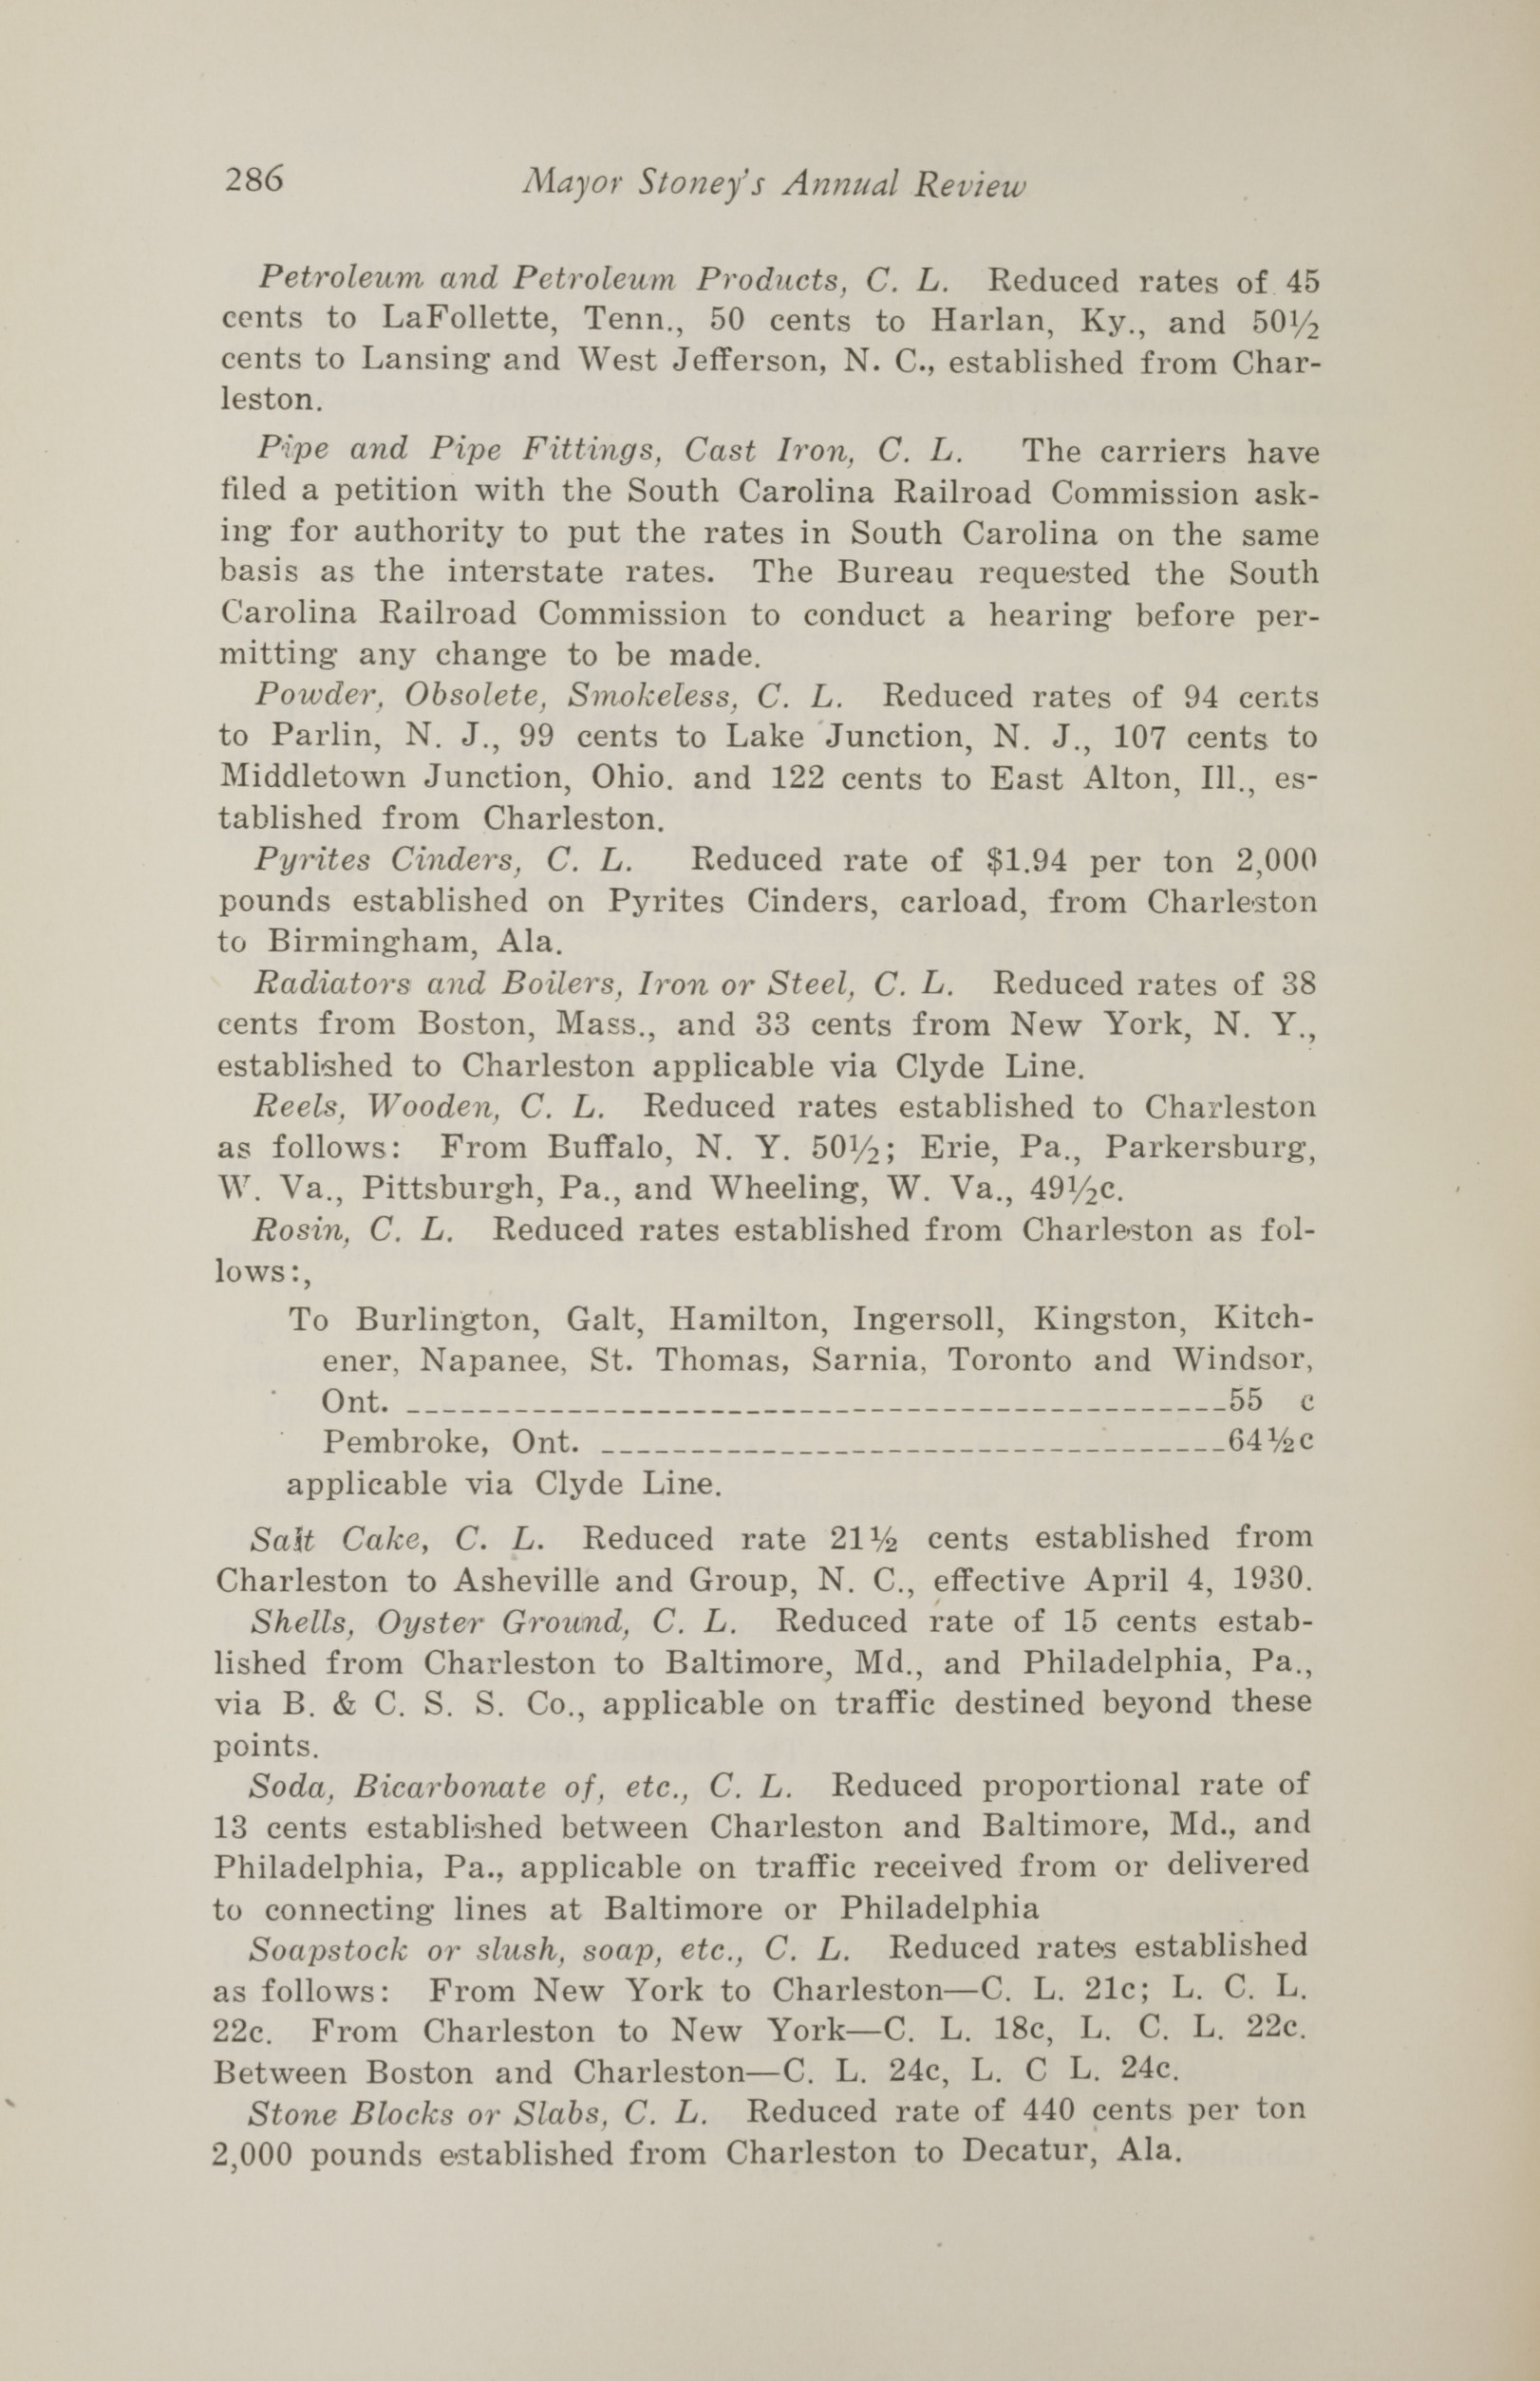 Charleston Yearbook, 1930, page 286